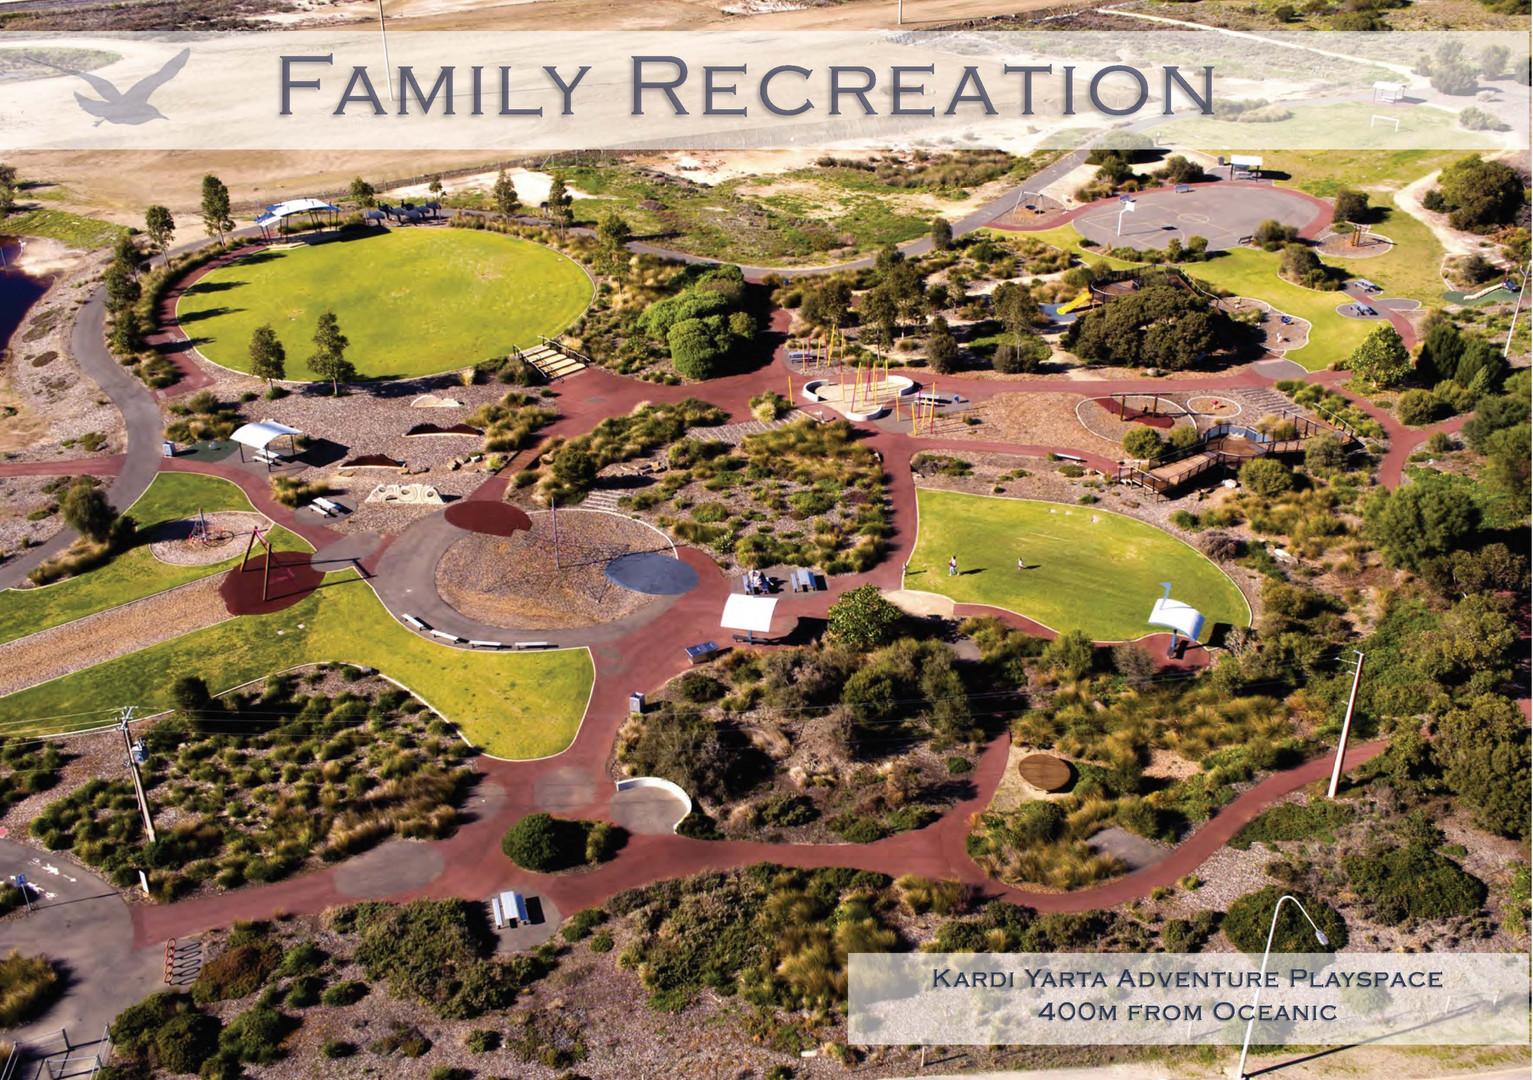 Oceanic Family Recreation Playground